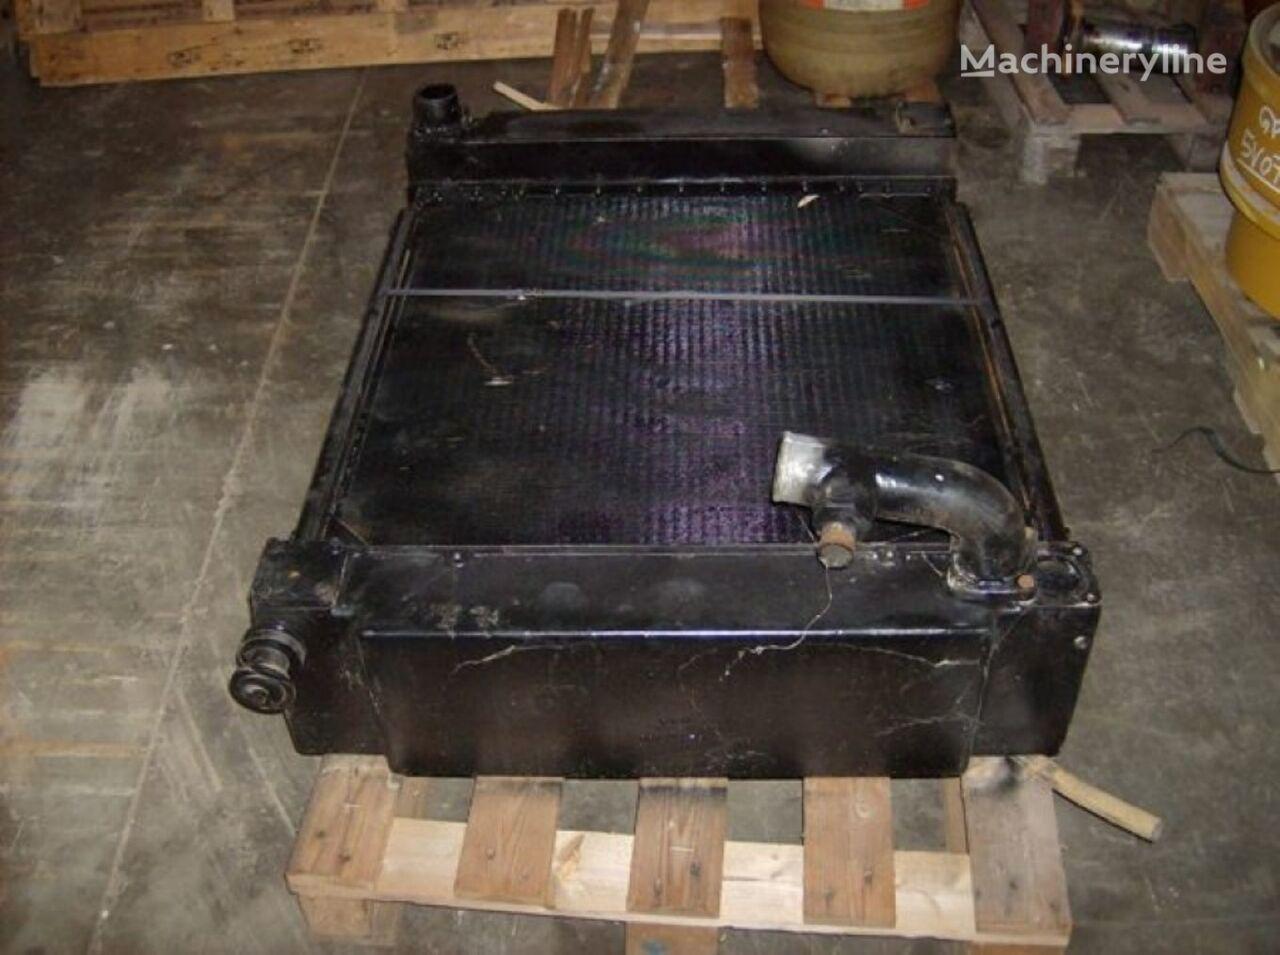 RADIATOR GP 5MG324 engine cooling radiator for CATERPILLAR D300D 5MG324 articulated dump truck